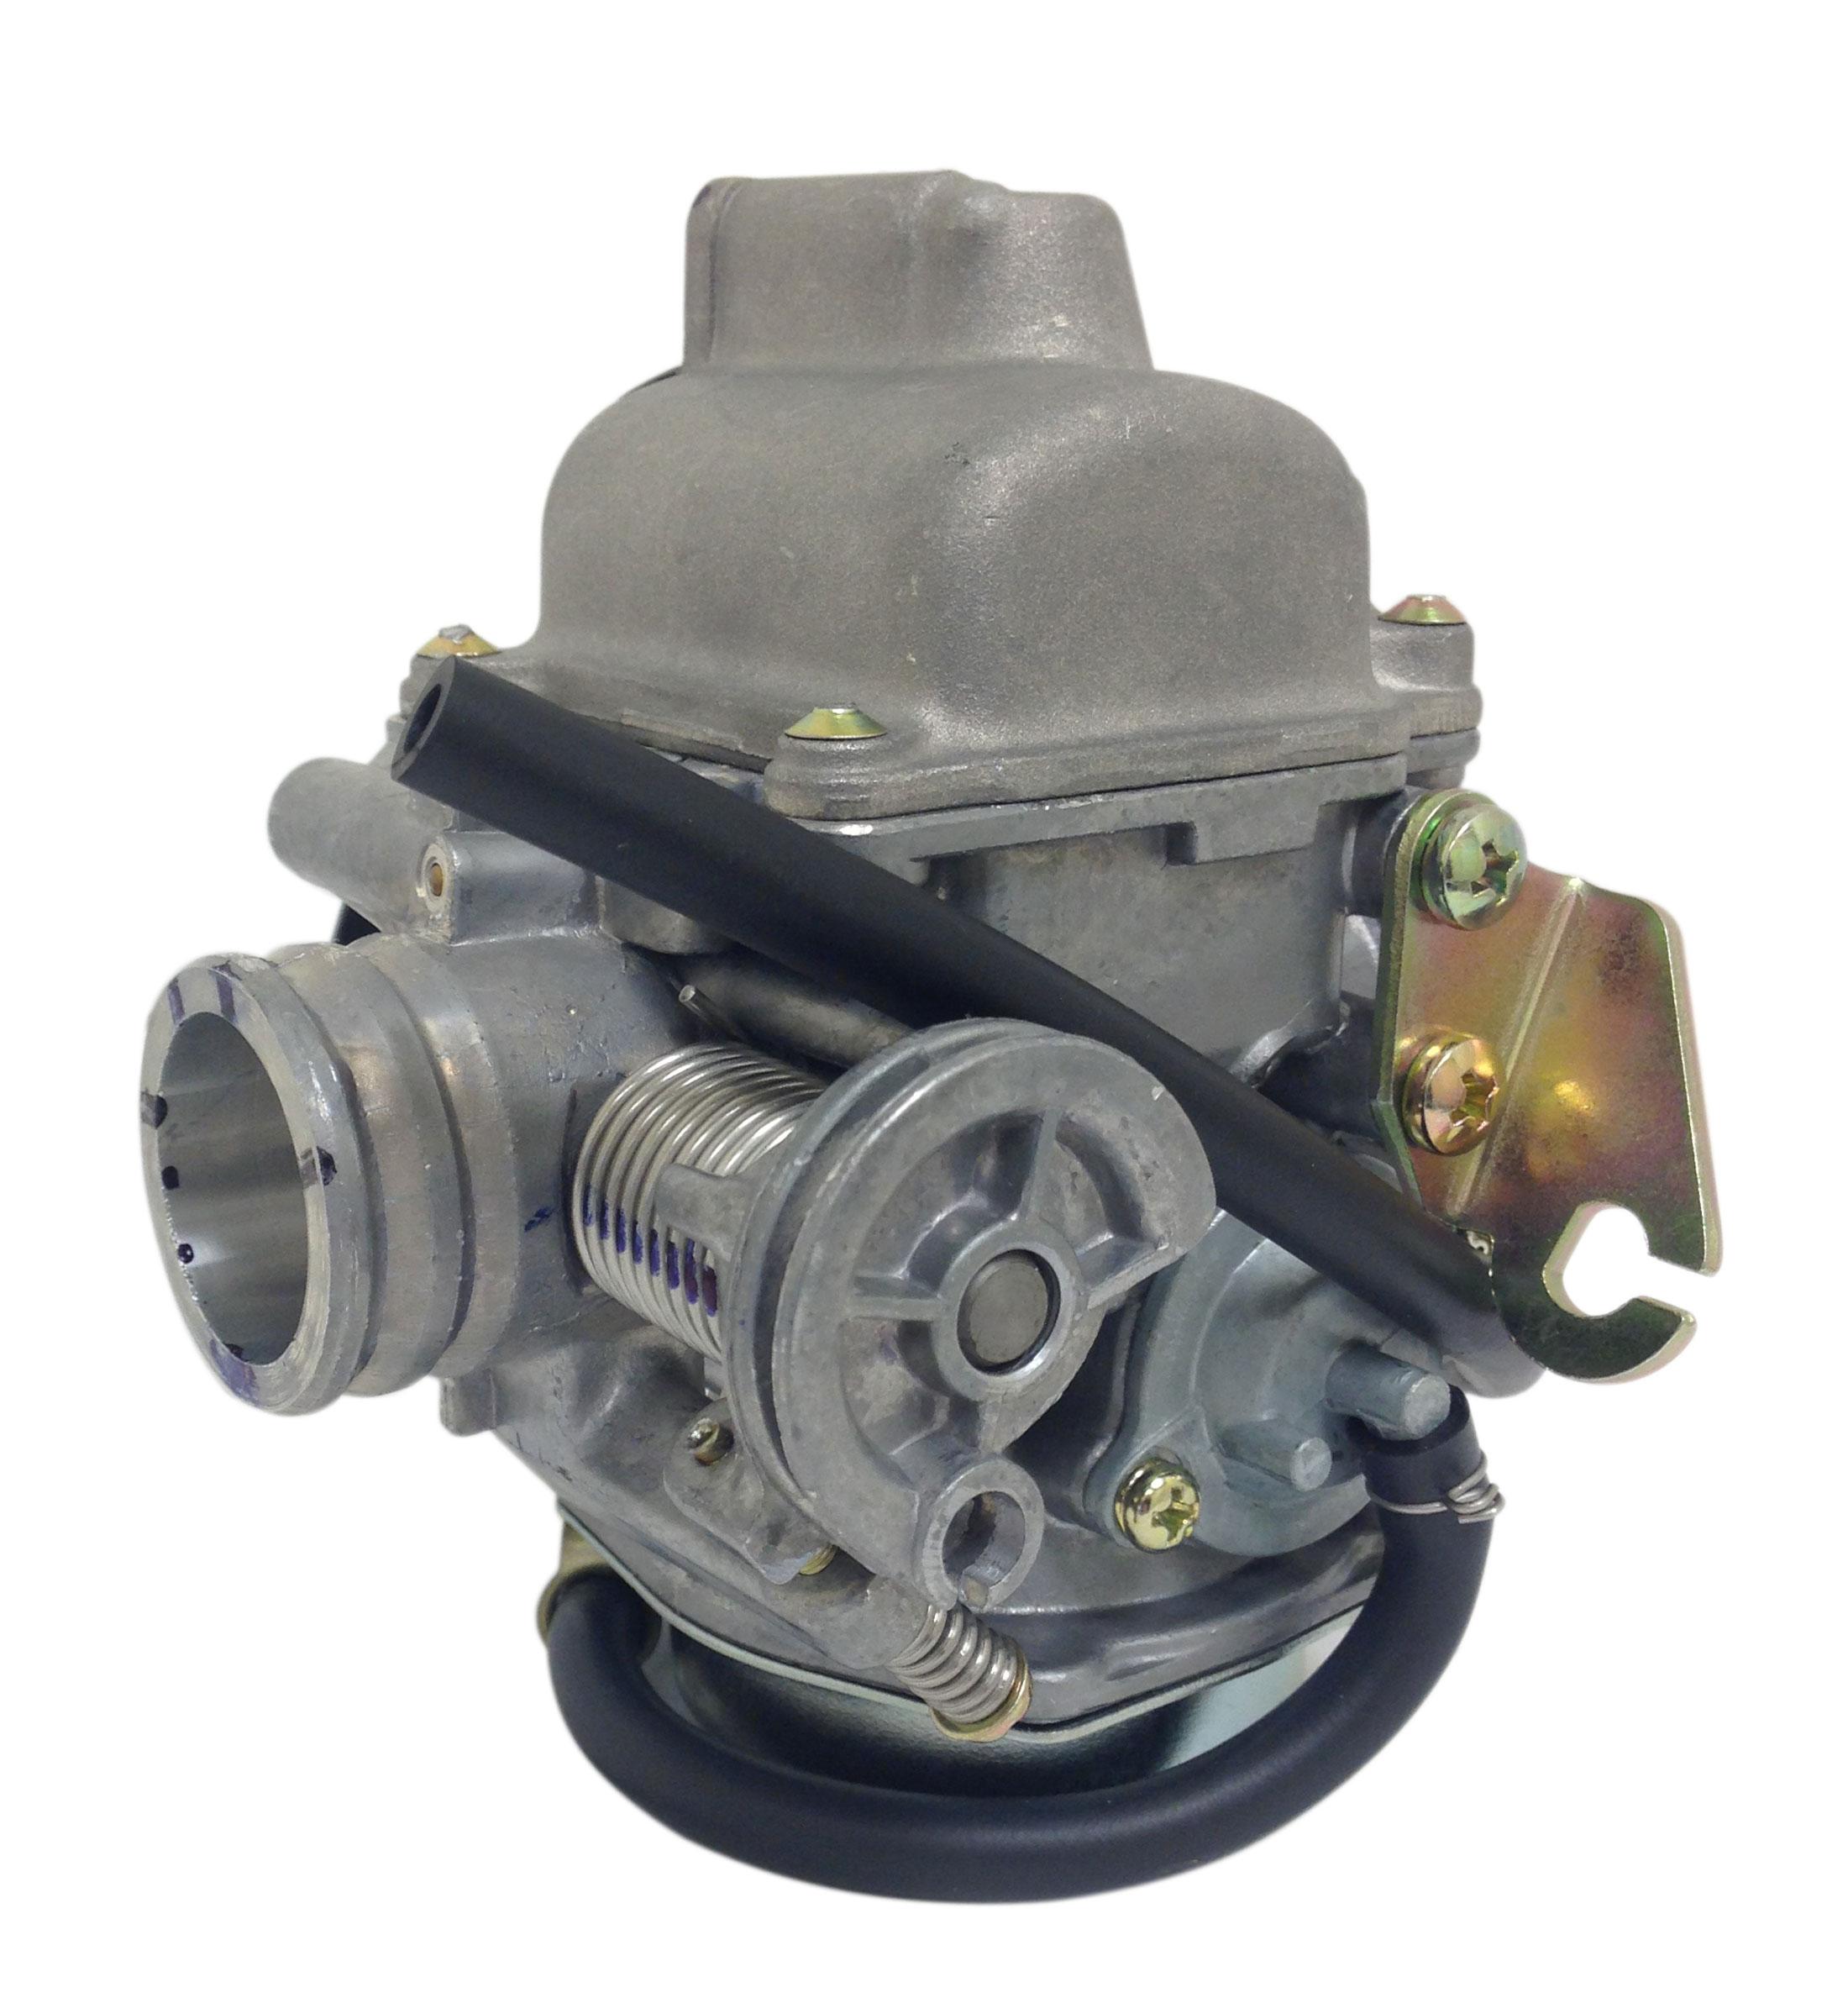 150cc Carburetor For Gy6 Engine Manual Choke 640002